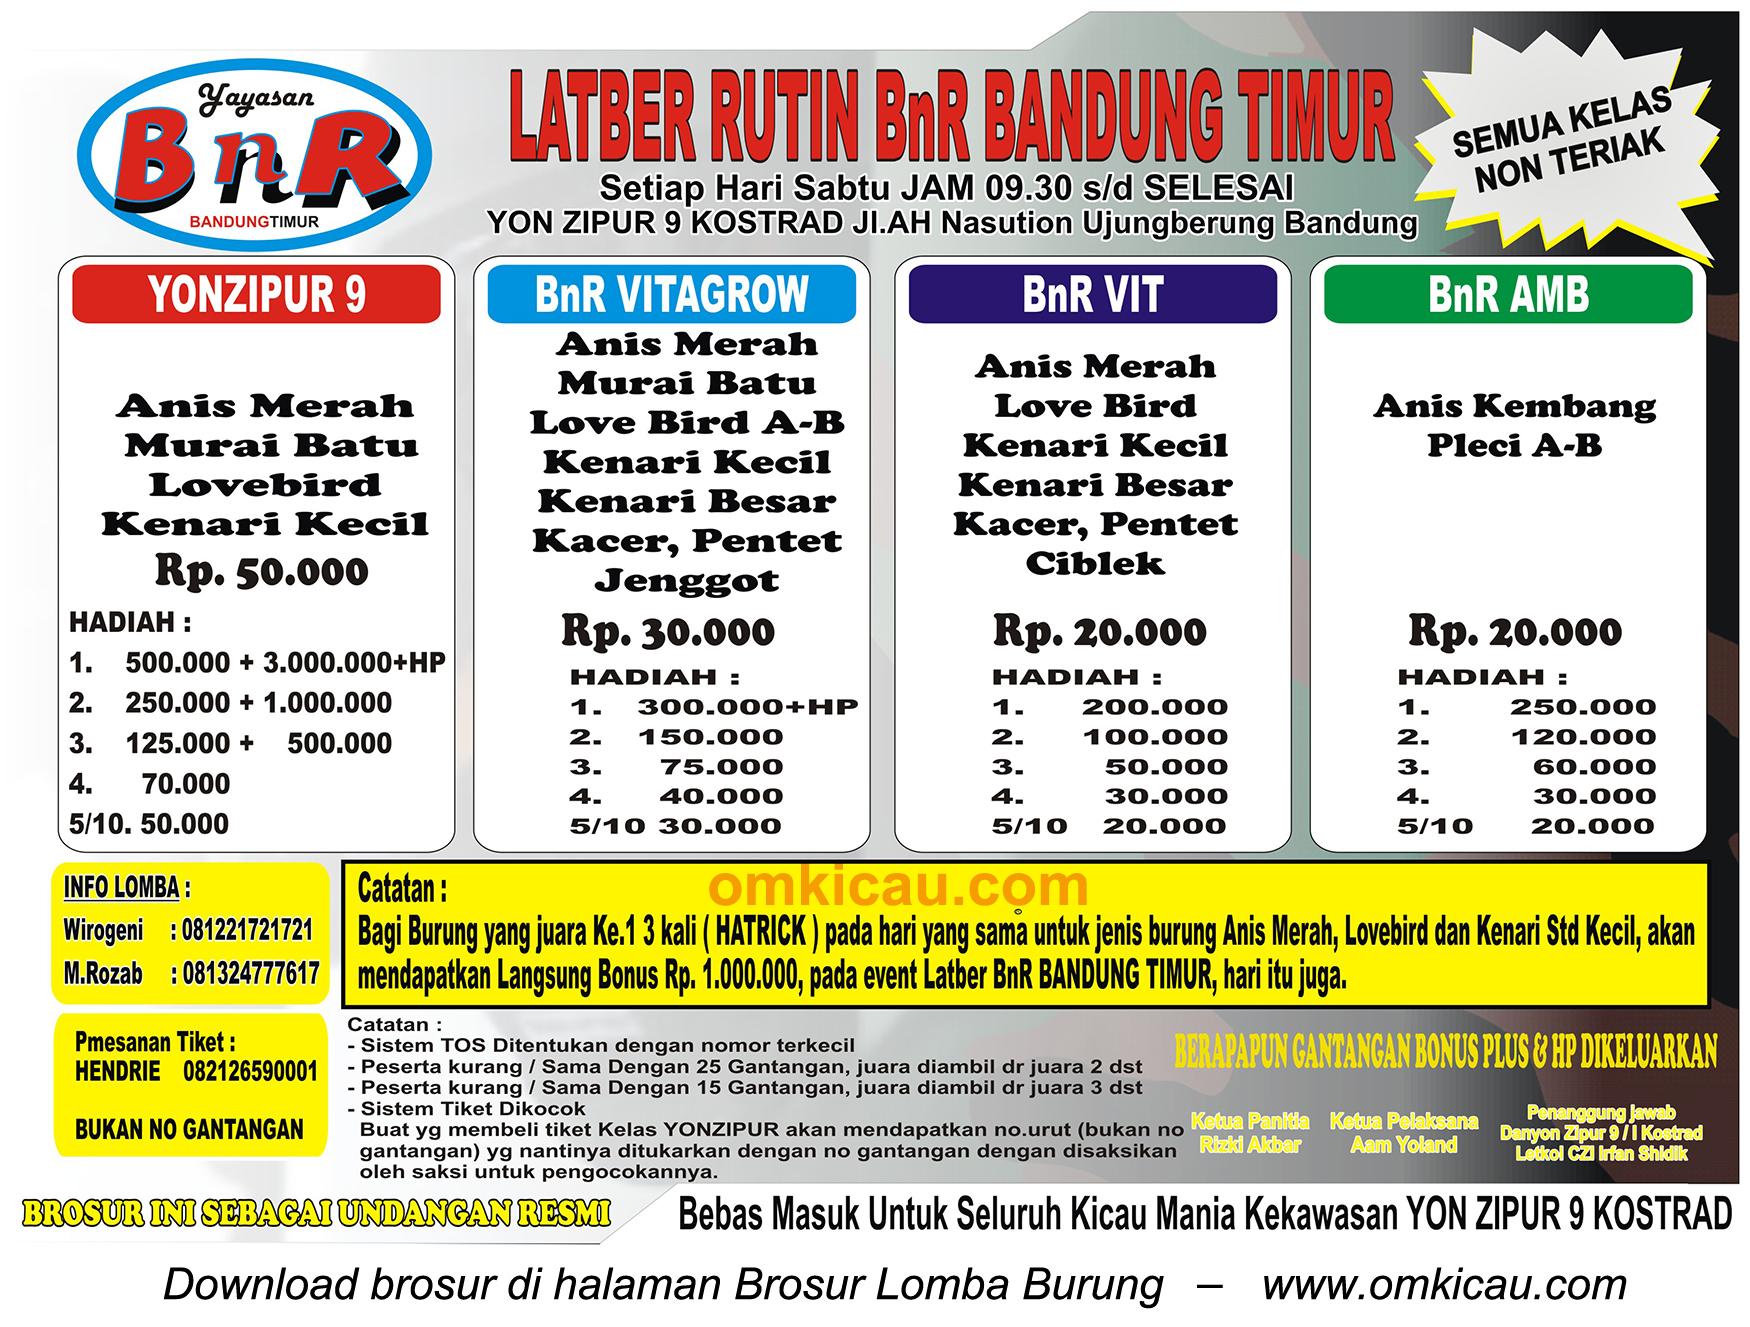 Latber Rutin BnR Bandung Timur